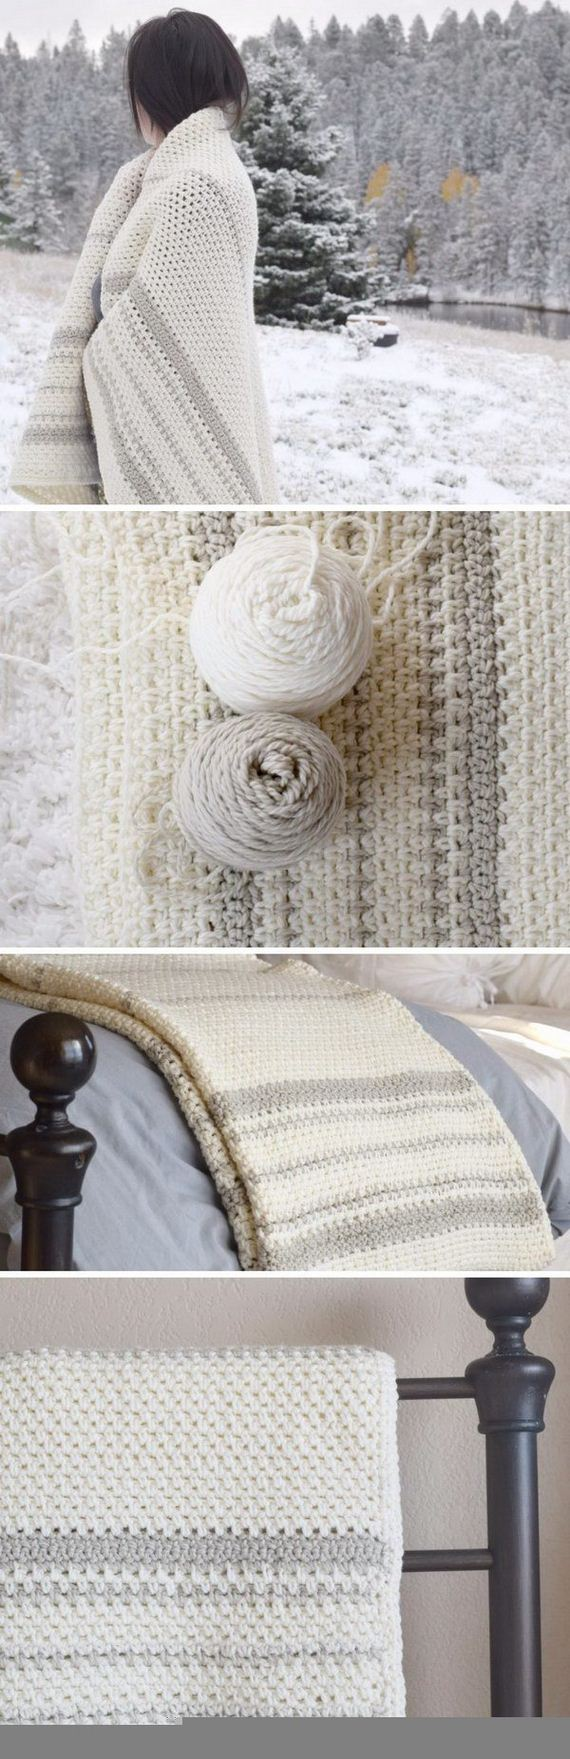 27-cool-easy-crochet-blankets